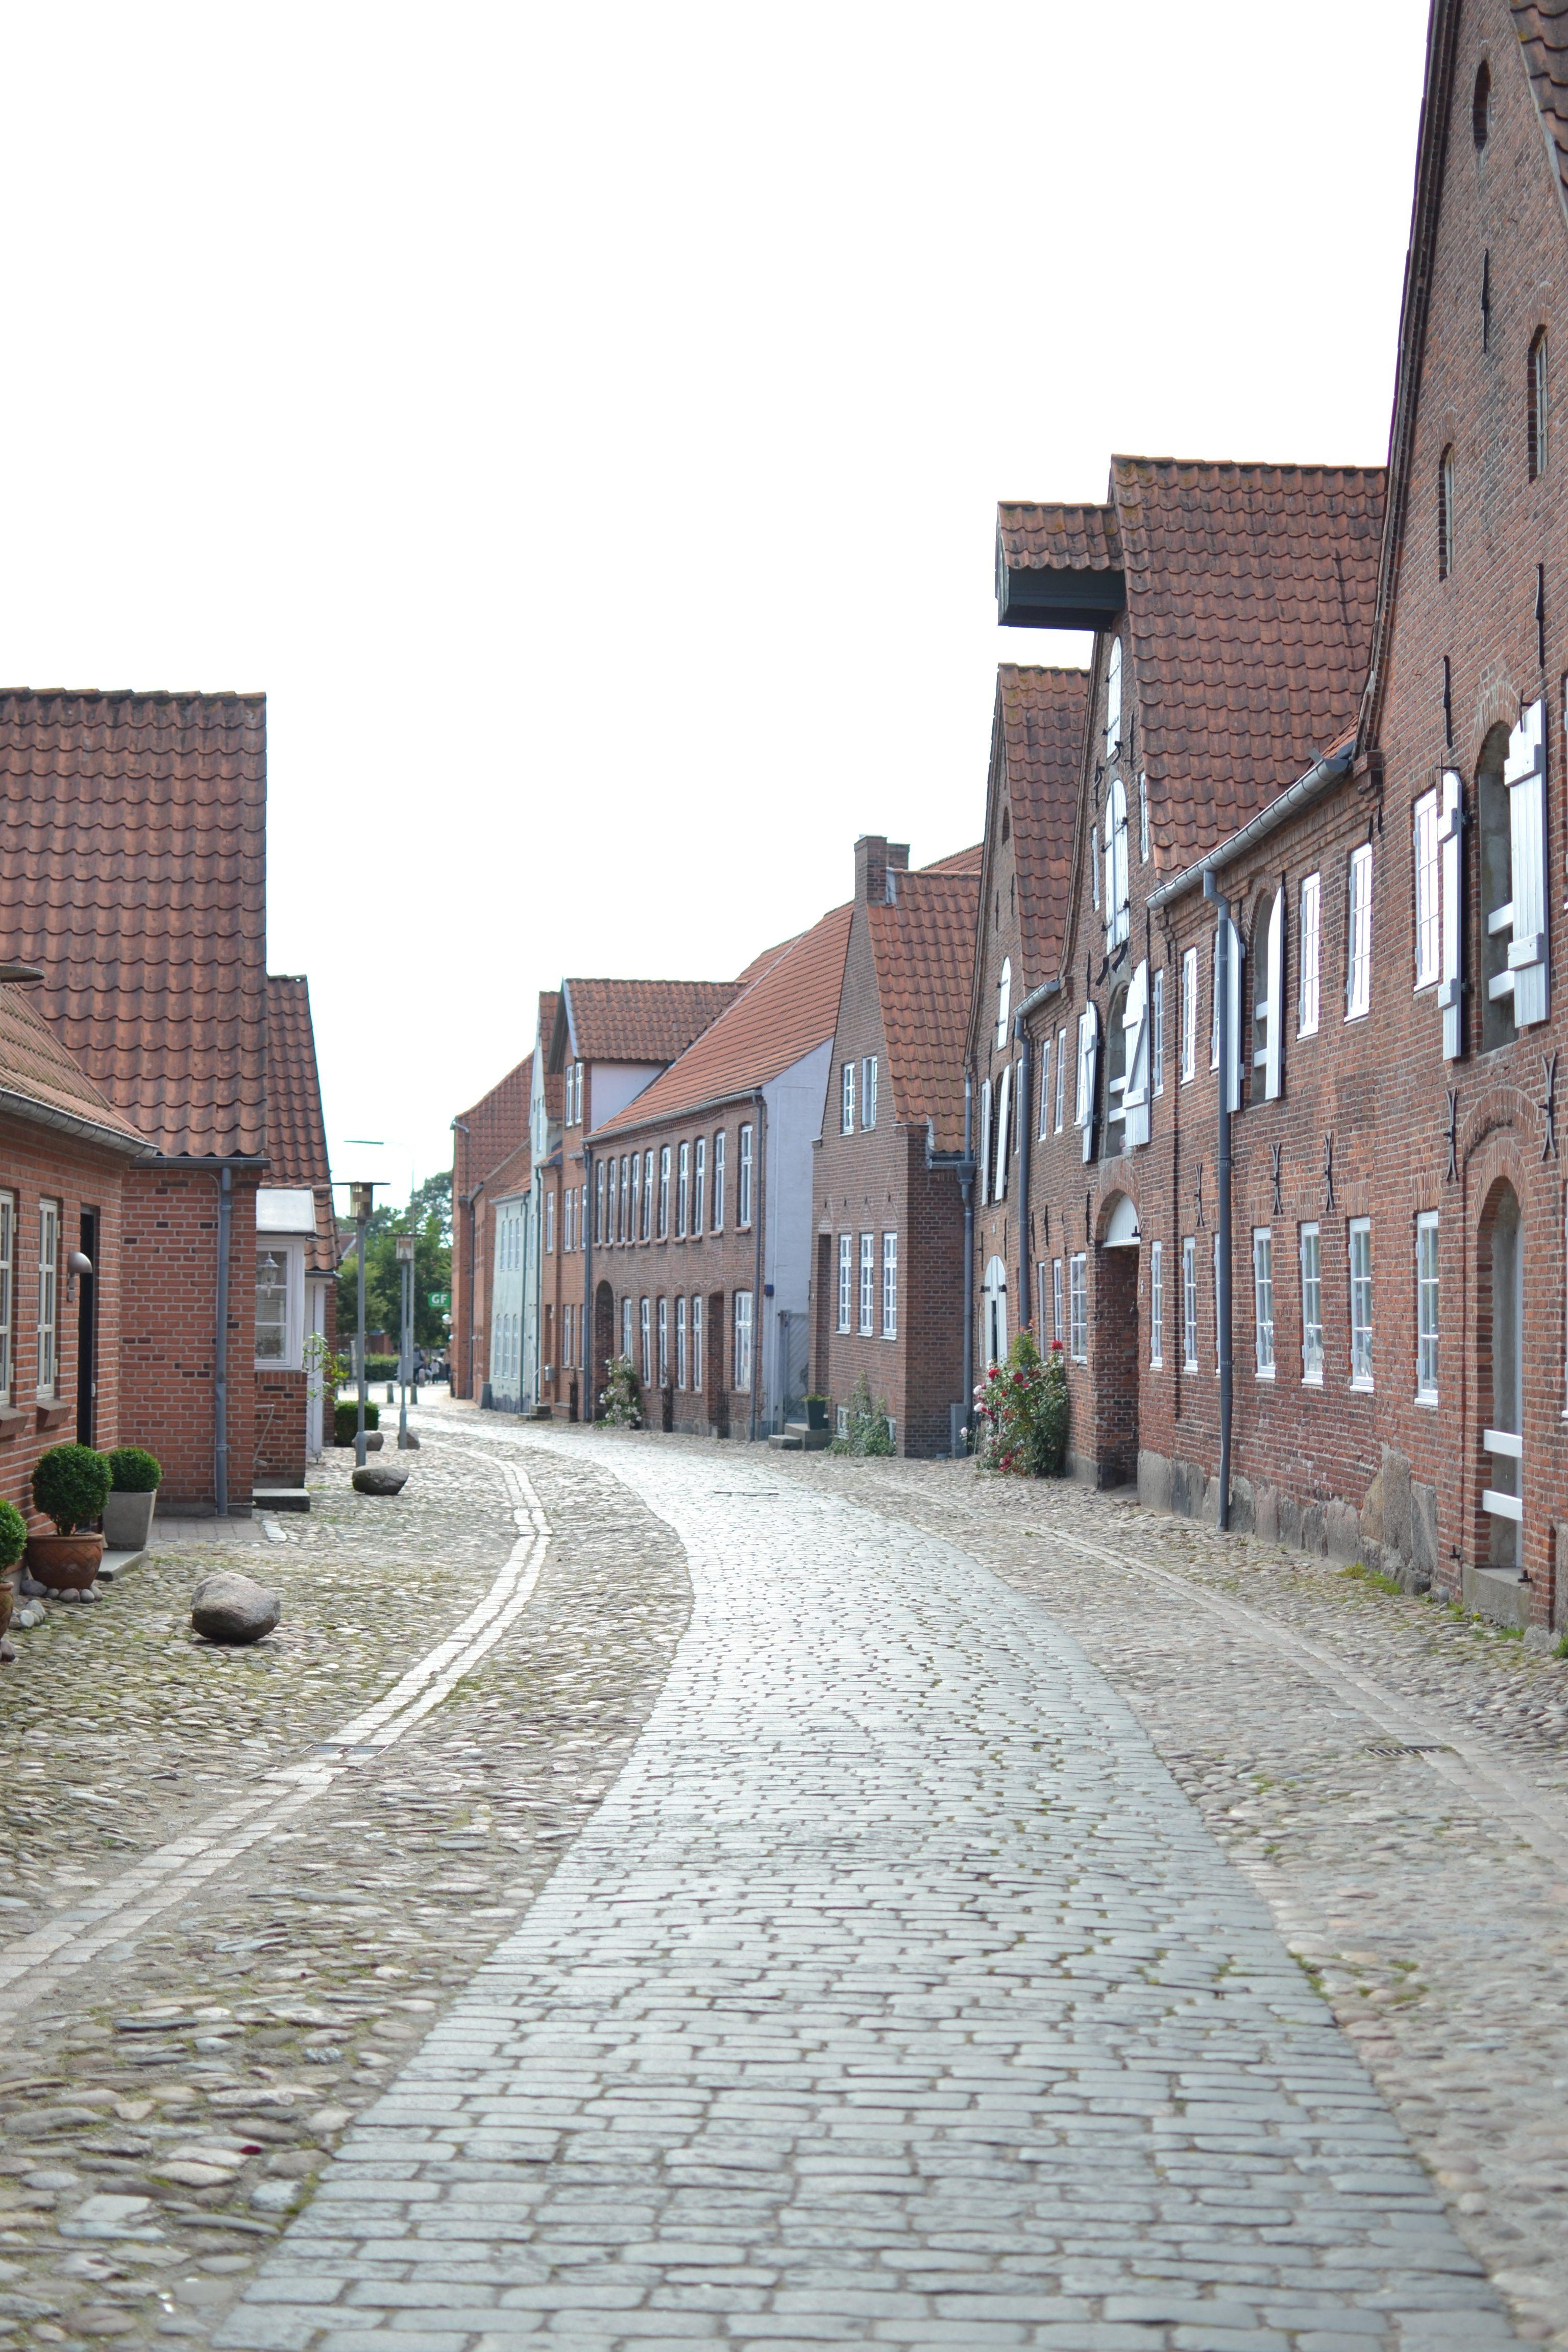 Sønderjylland: <strong>Kolonihaveliv i Tønder</strong> 7